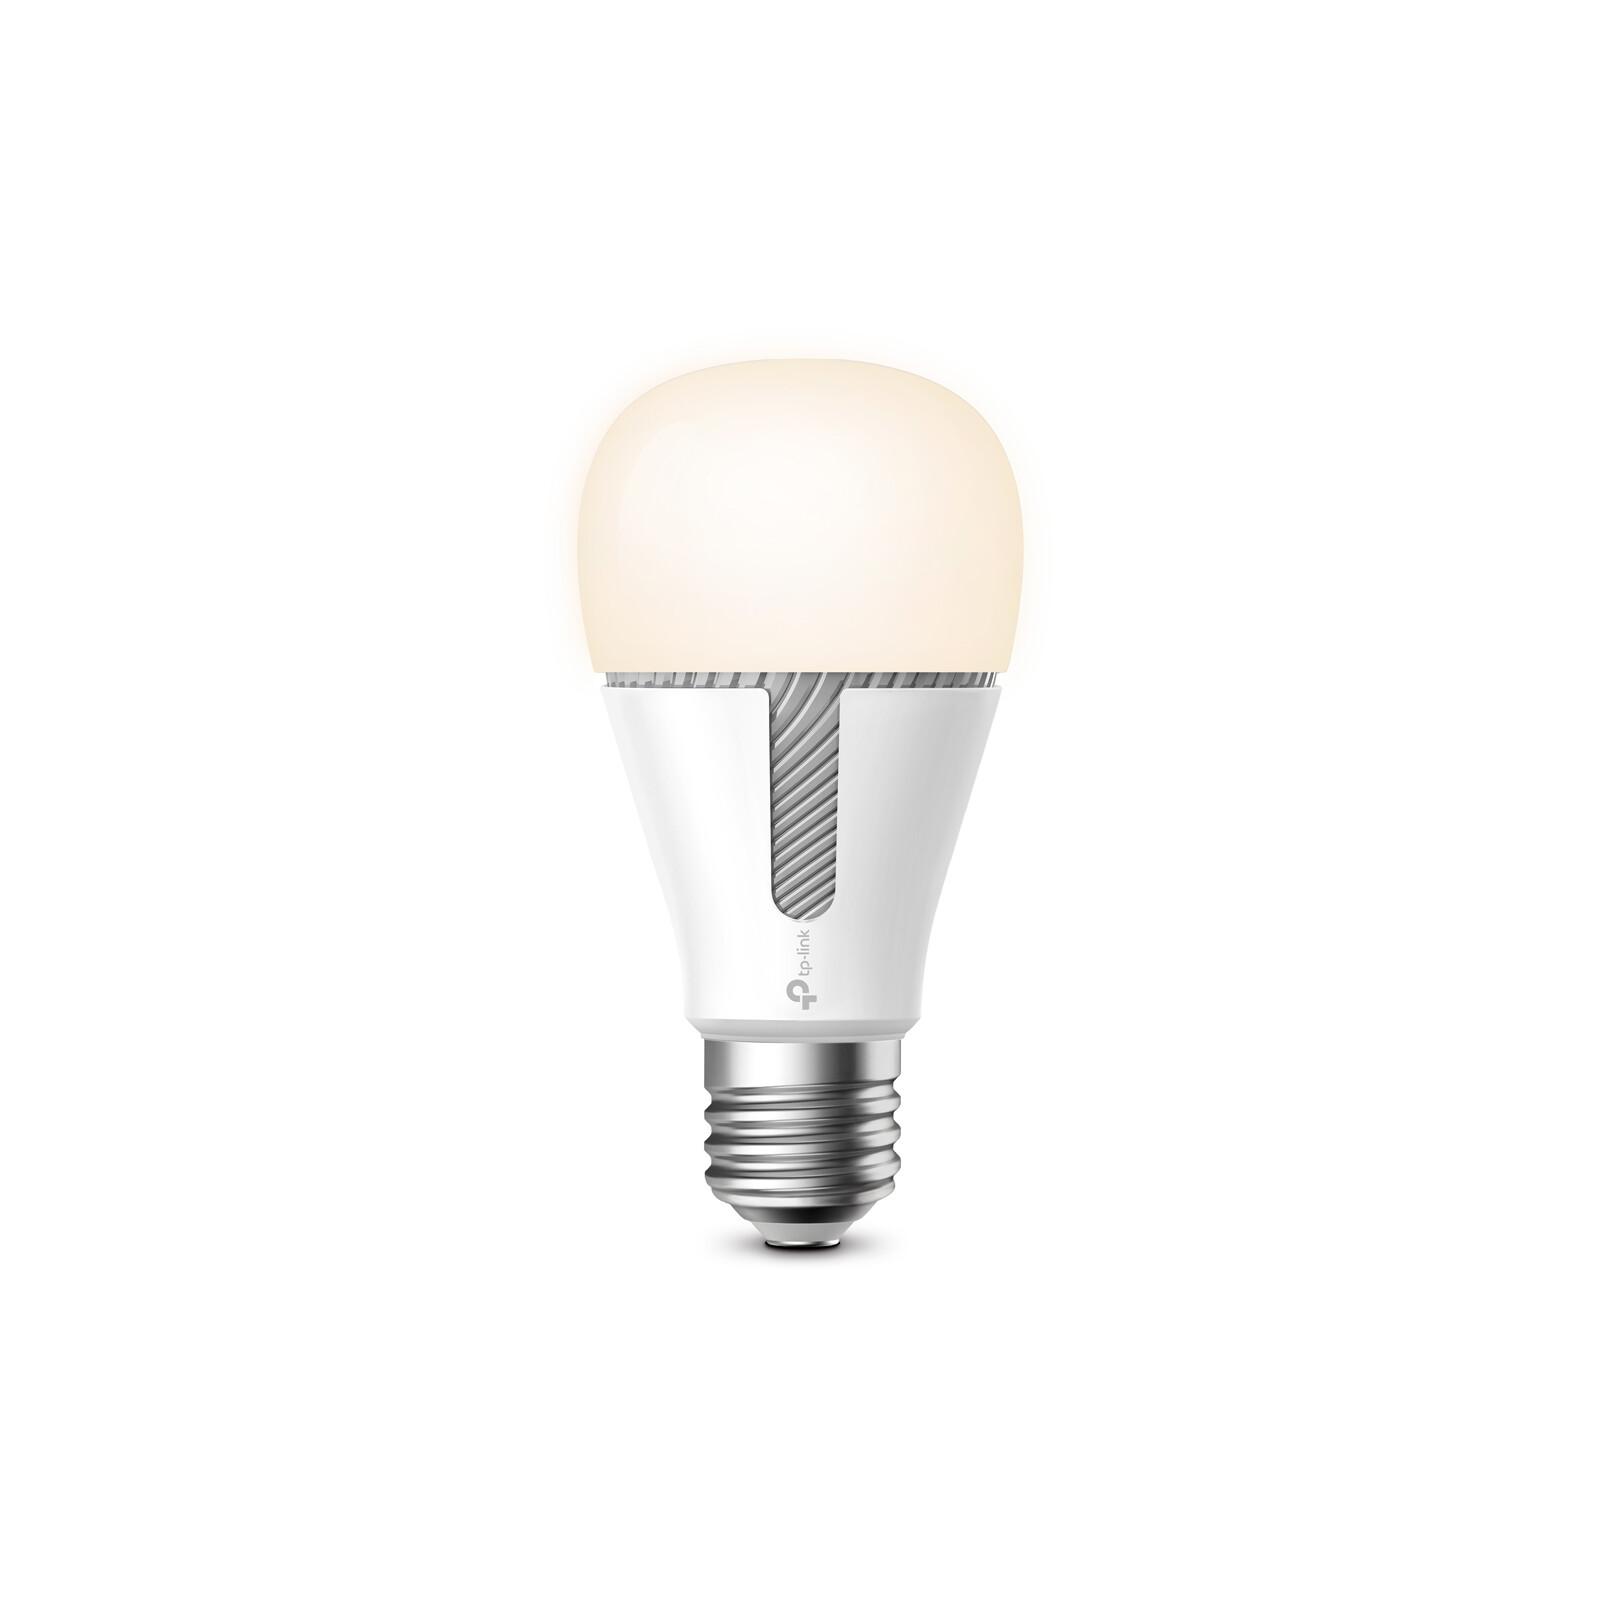 TP-Link KL120 Smart Wifi LED Bulb